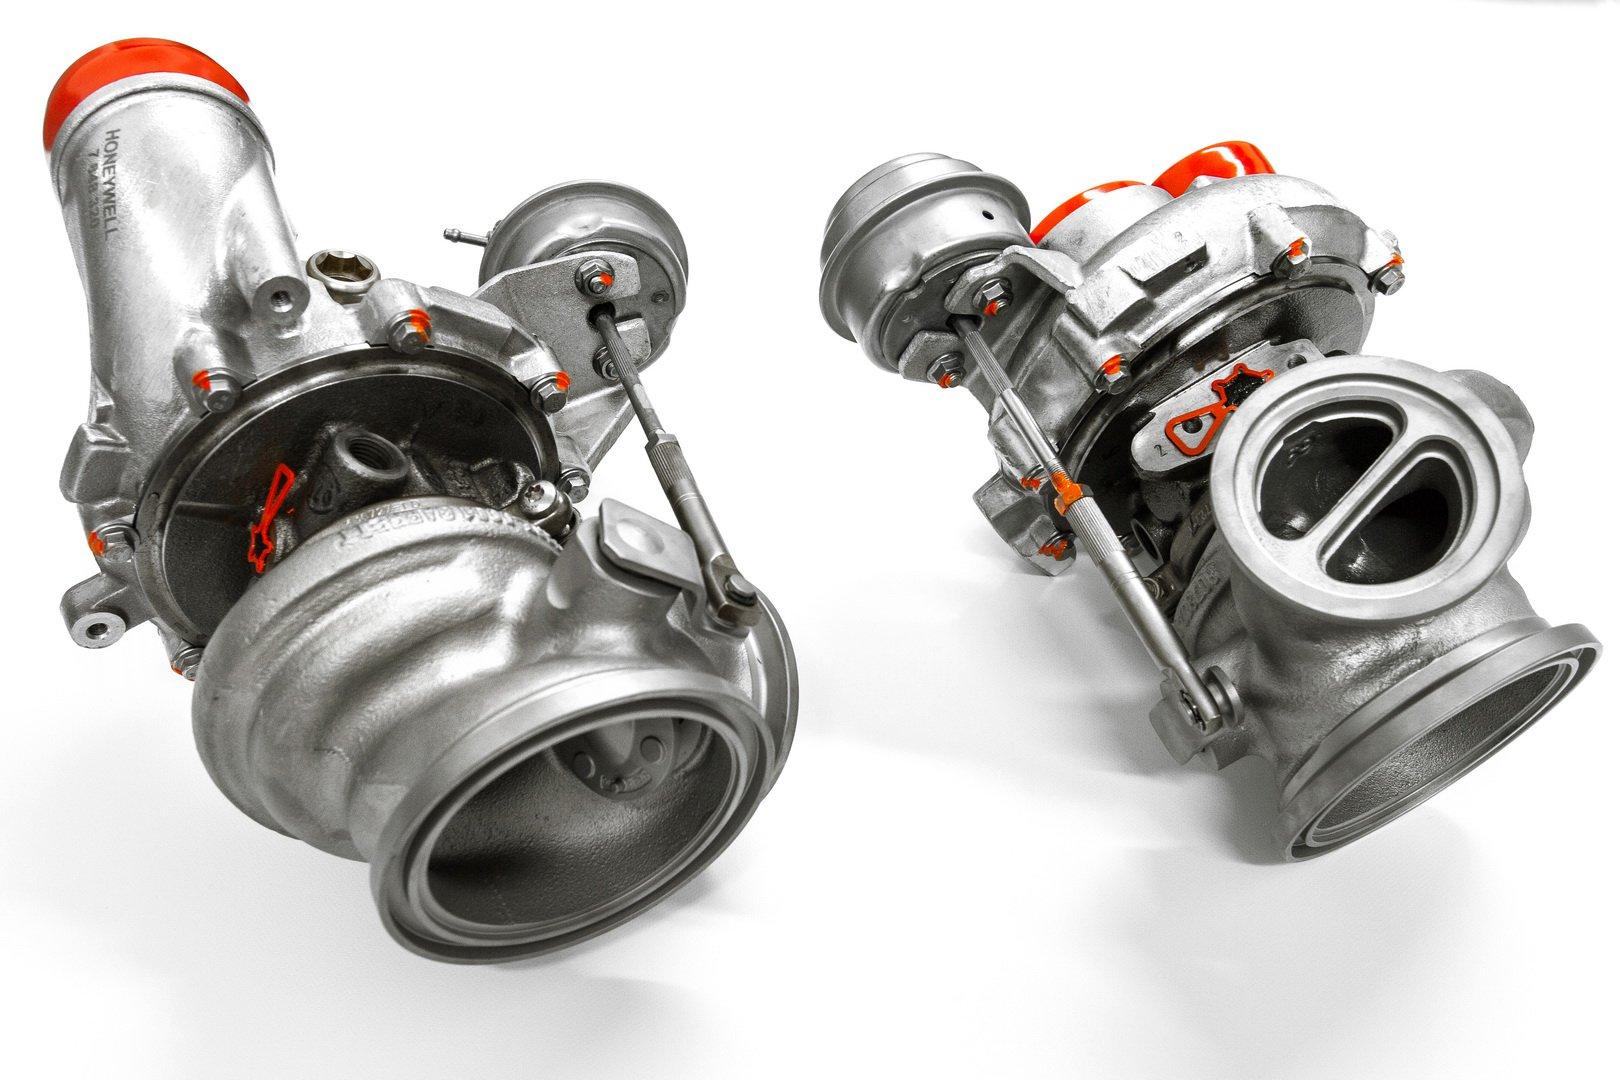 2019-mercedes-amg-g63-tuning-wheelsandmore-6.jpg